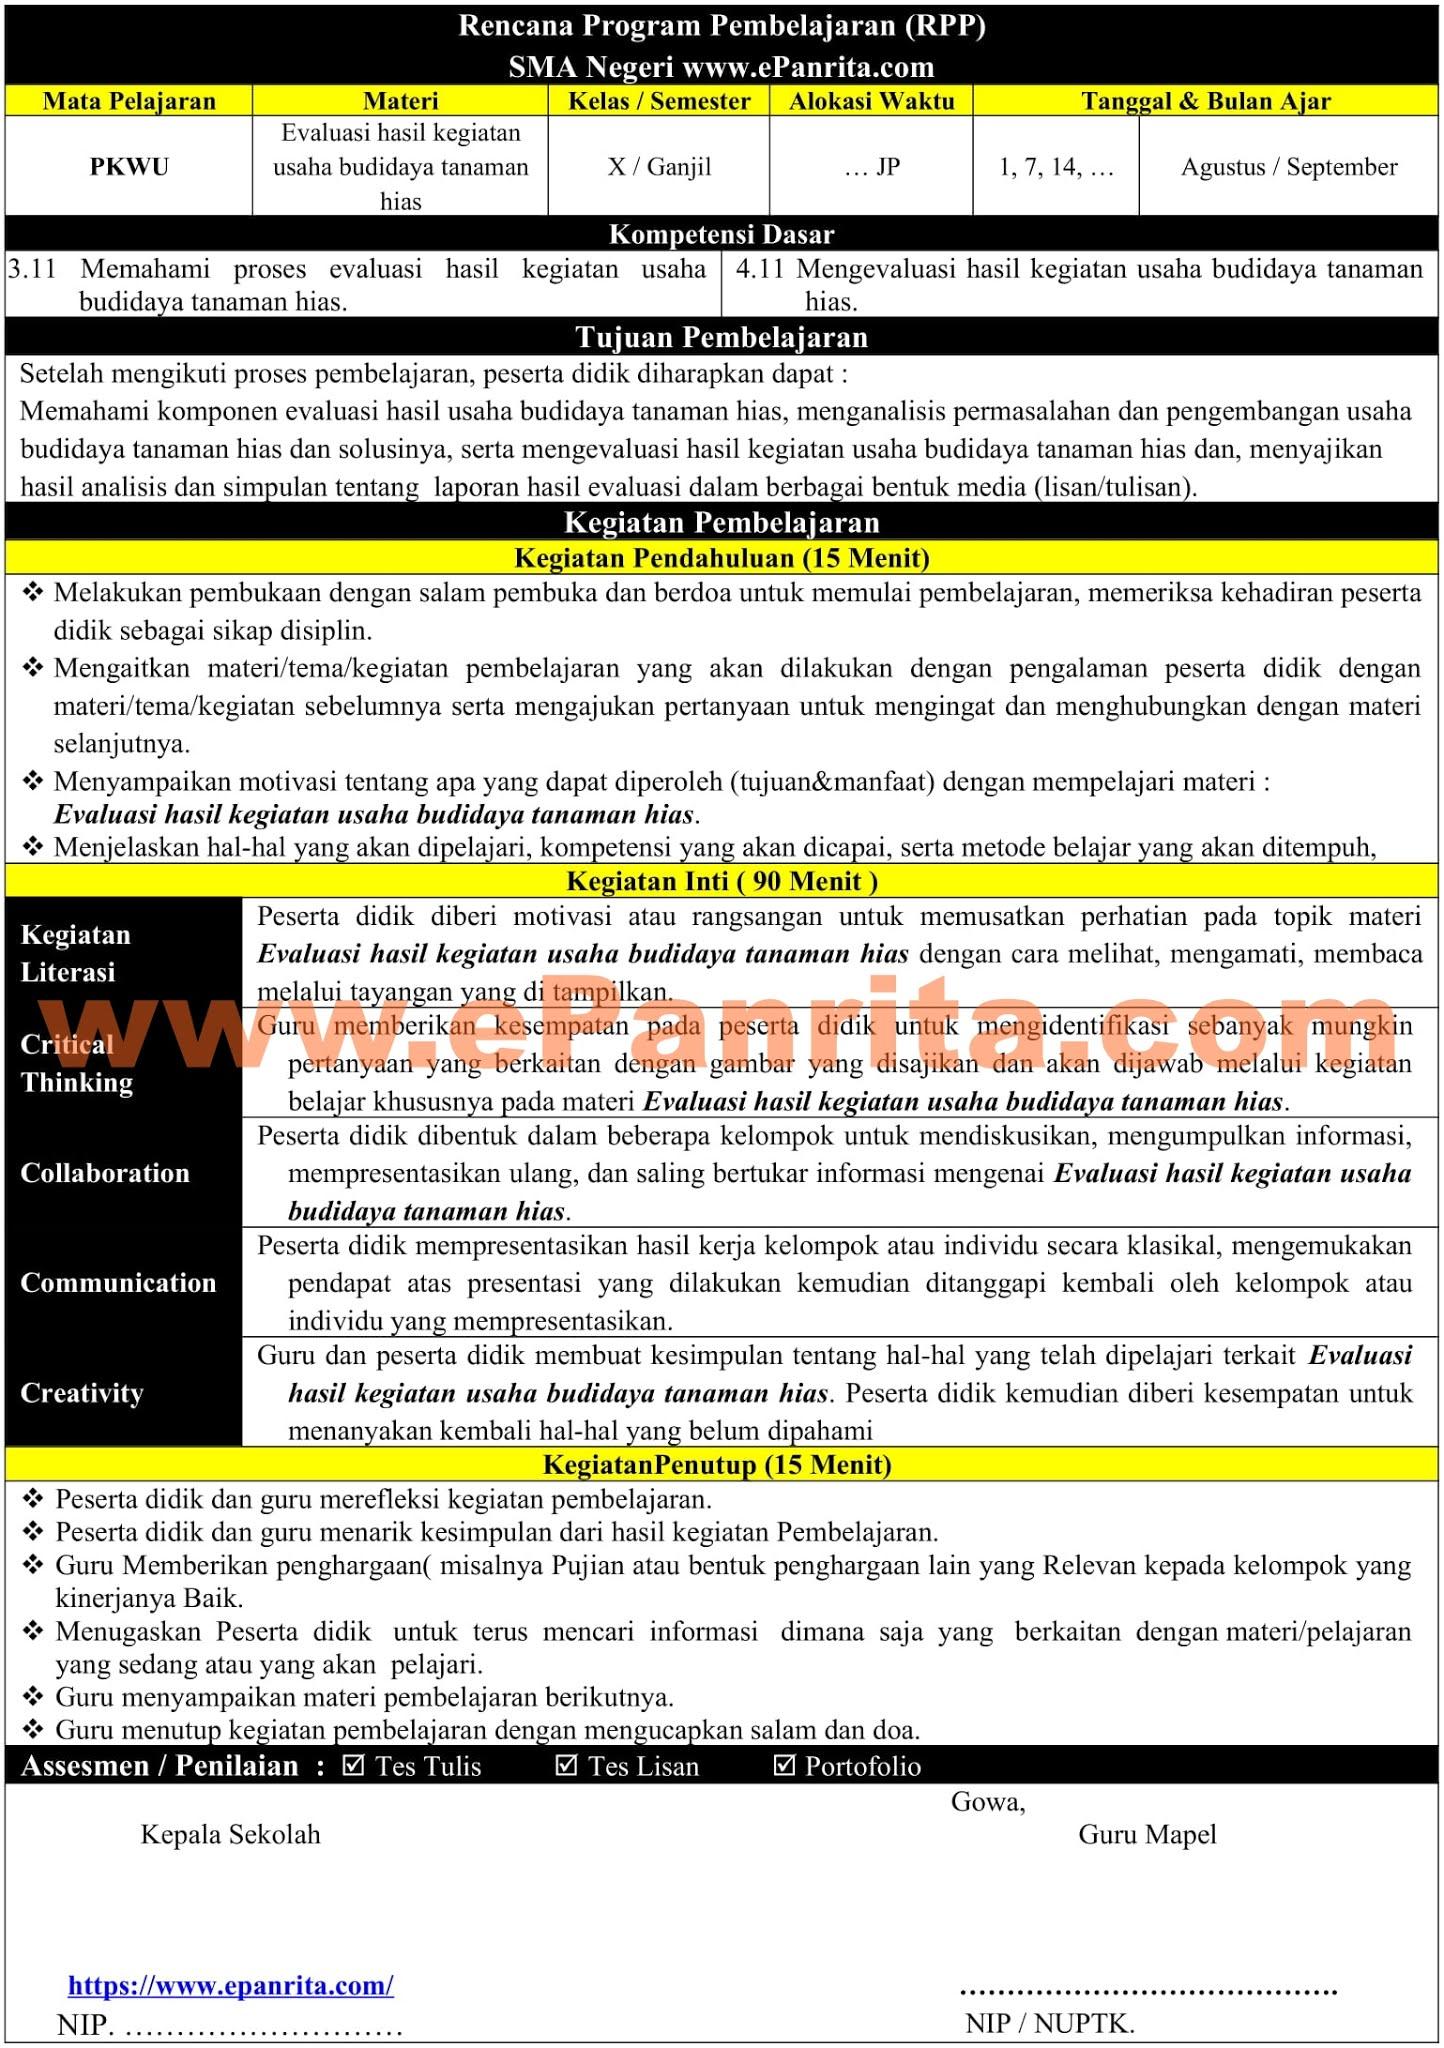 RPP 1 Halaman Prakarya Aspek Budidaya (Evaluasi hasil kegiatan usaha budidaya tanaman hias)